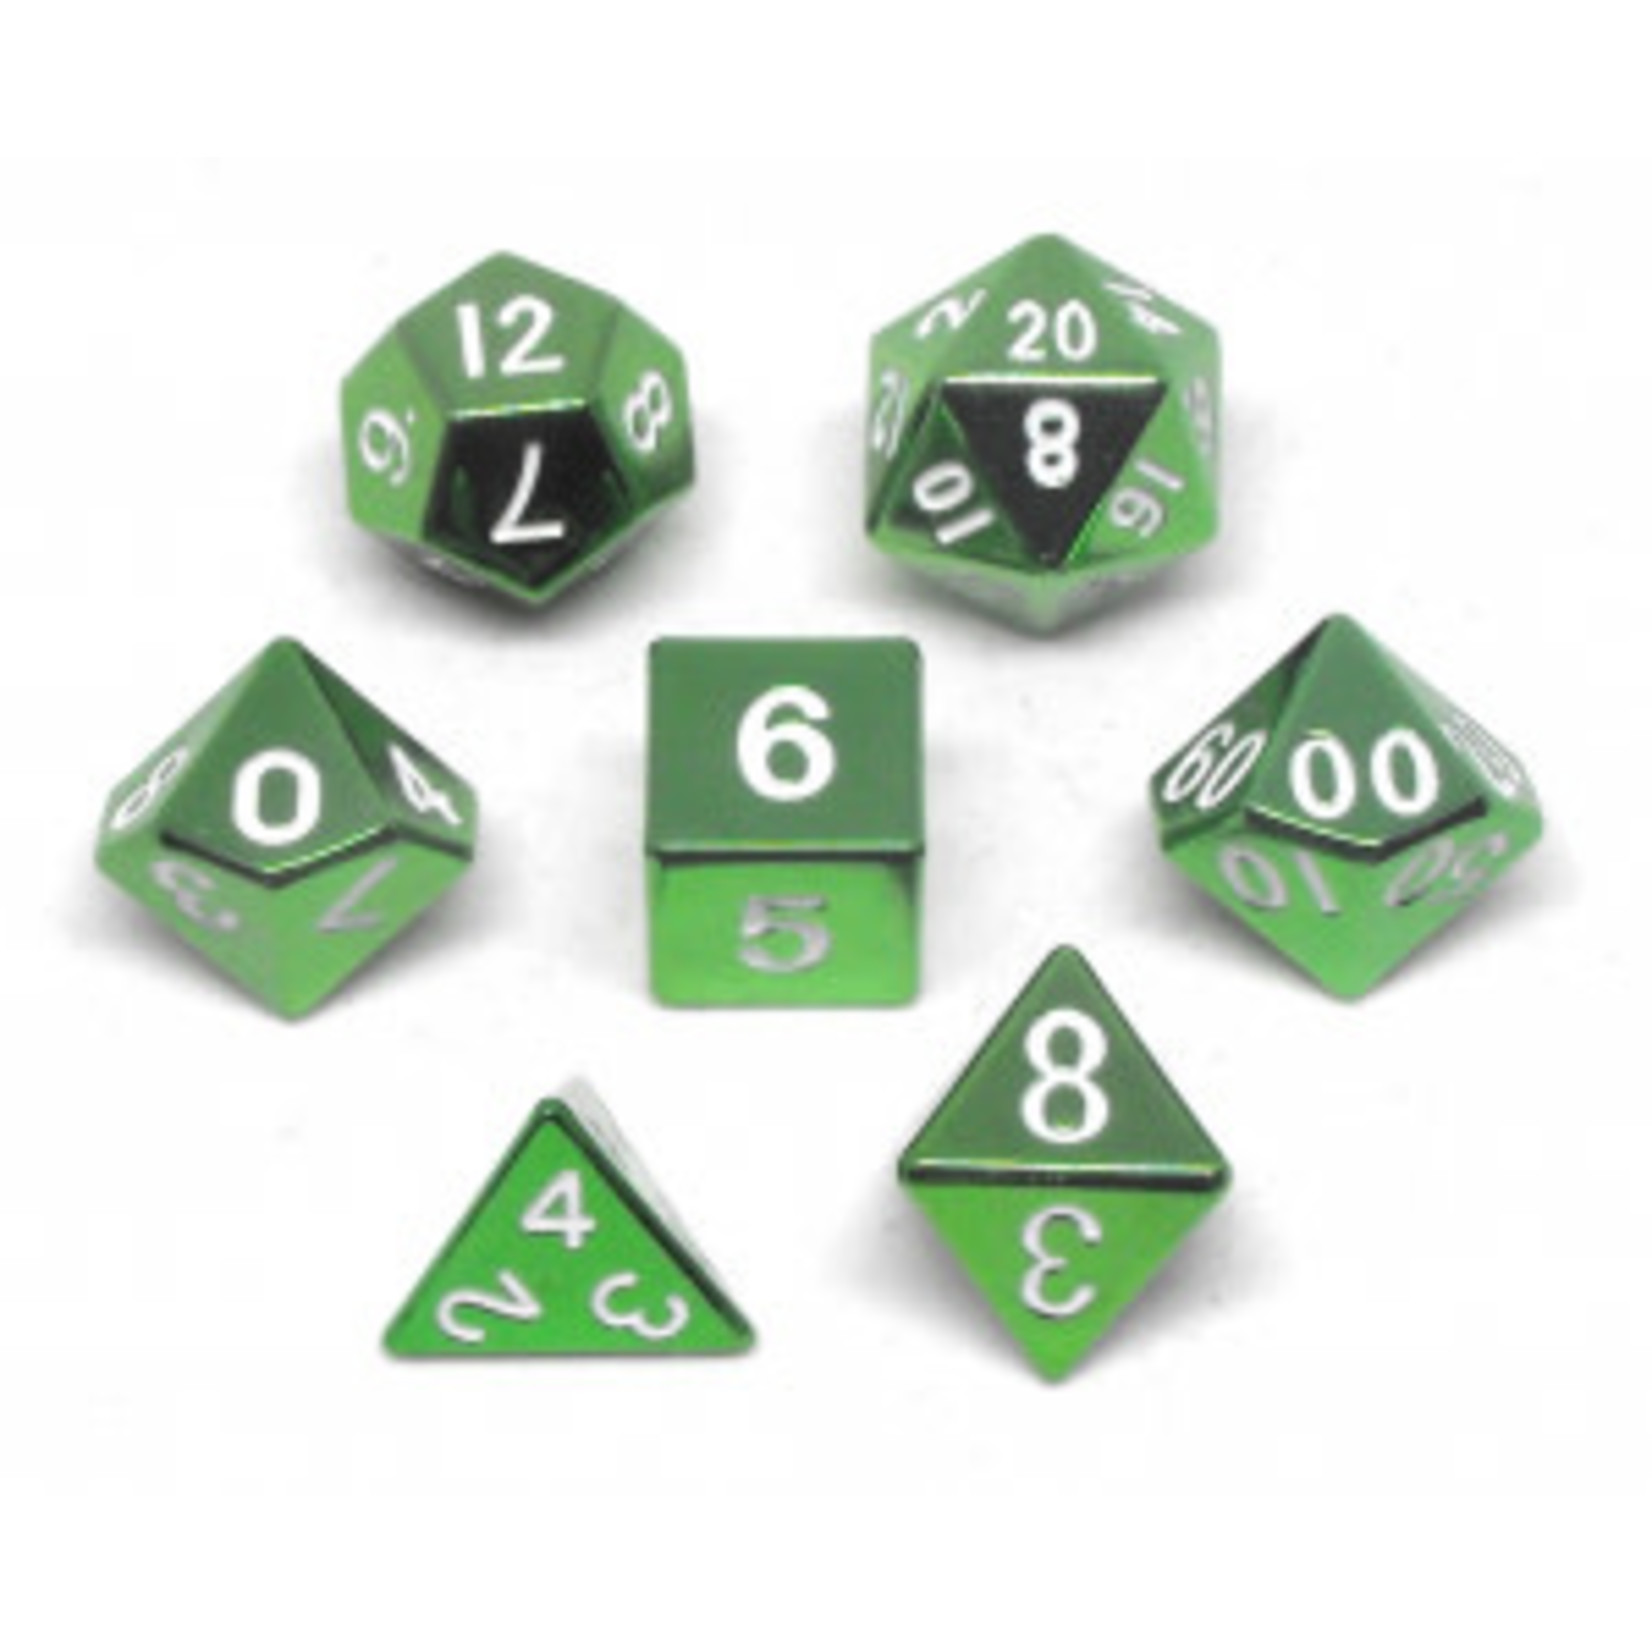 Metallic Dice Game Set 7D Poly Metallic Green/White